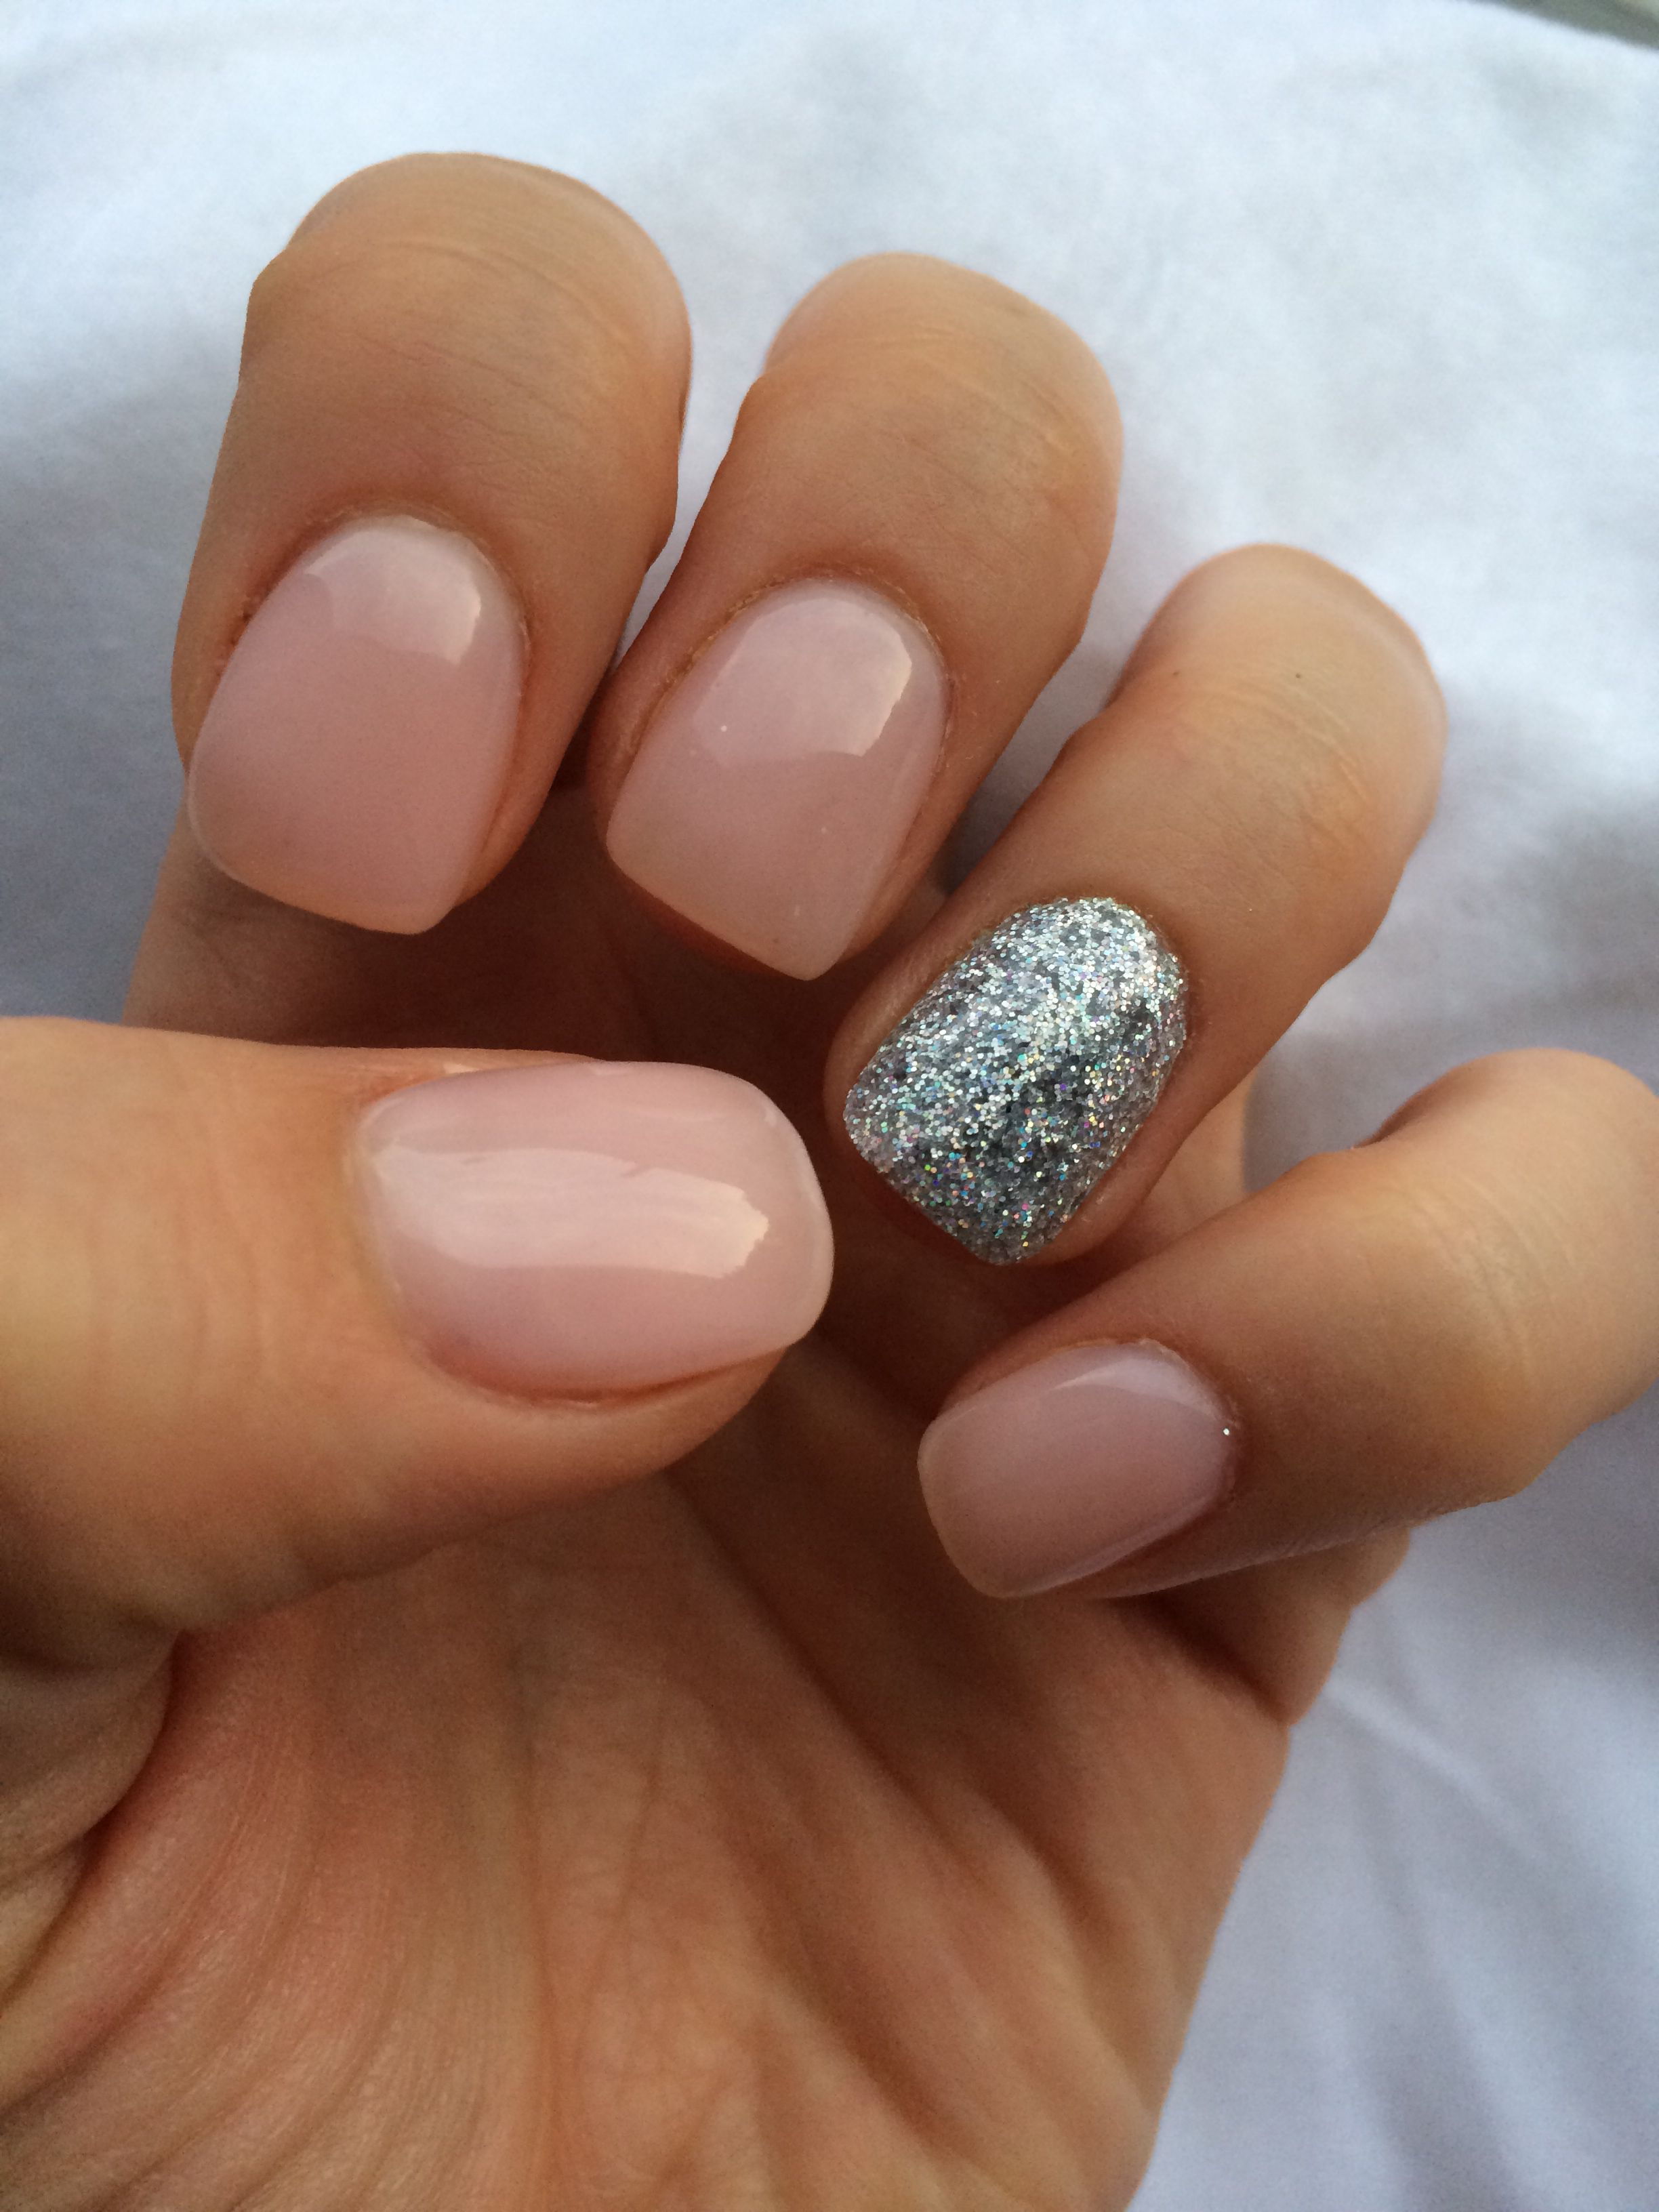 Oh la la | •nail designs• | Pinterest | Opi gel nail polish, Opi gel ...